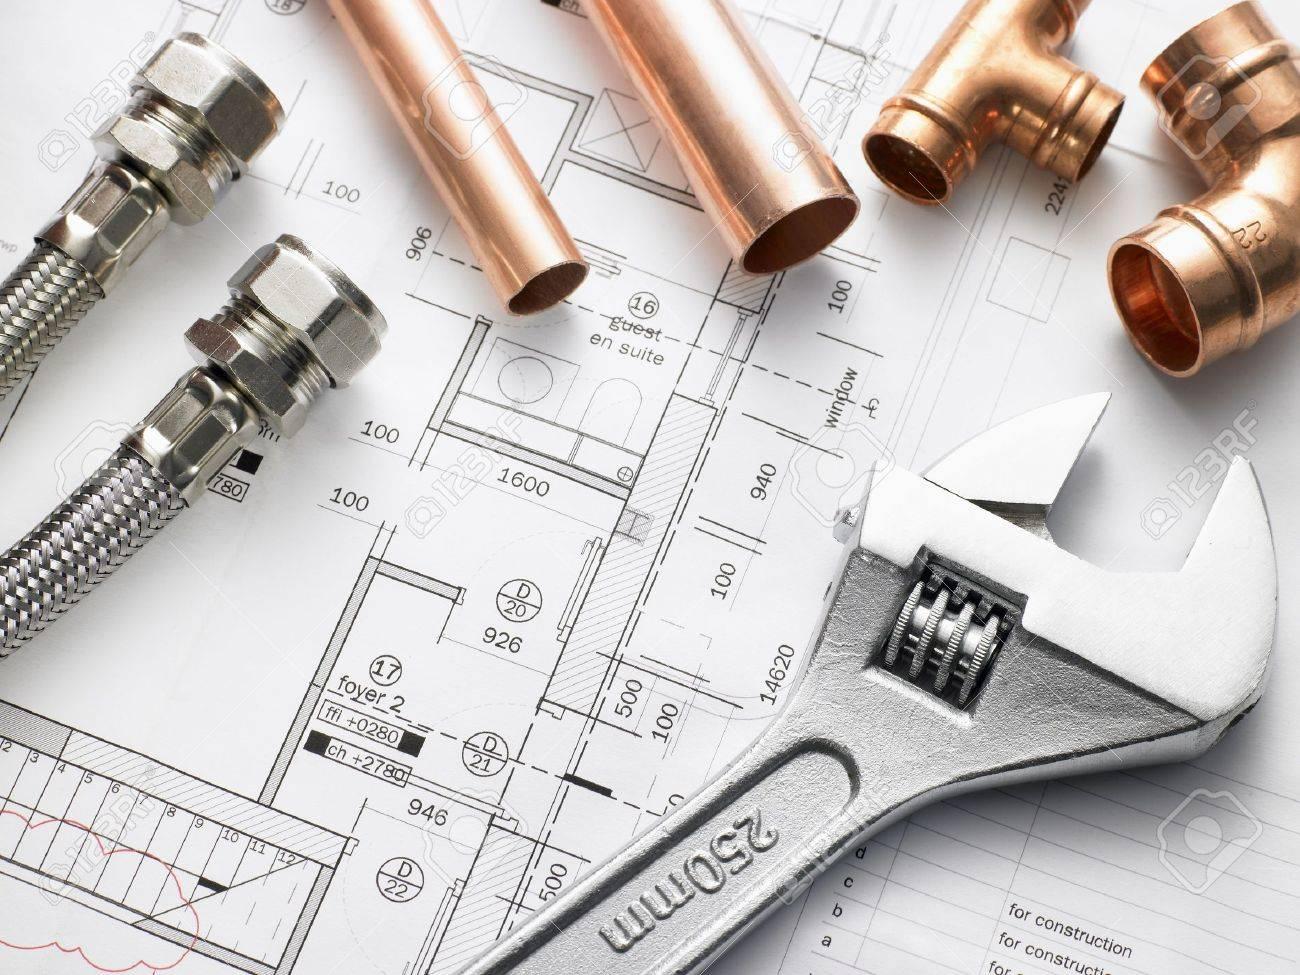 Plumbing Equipment On House Plans - 5297266